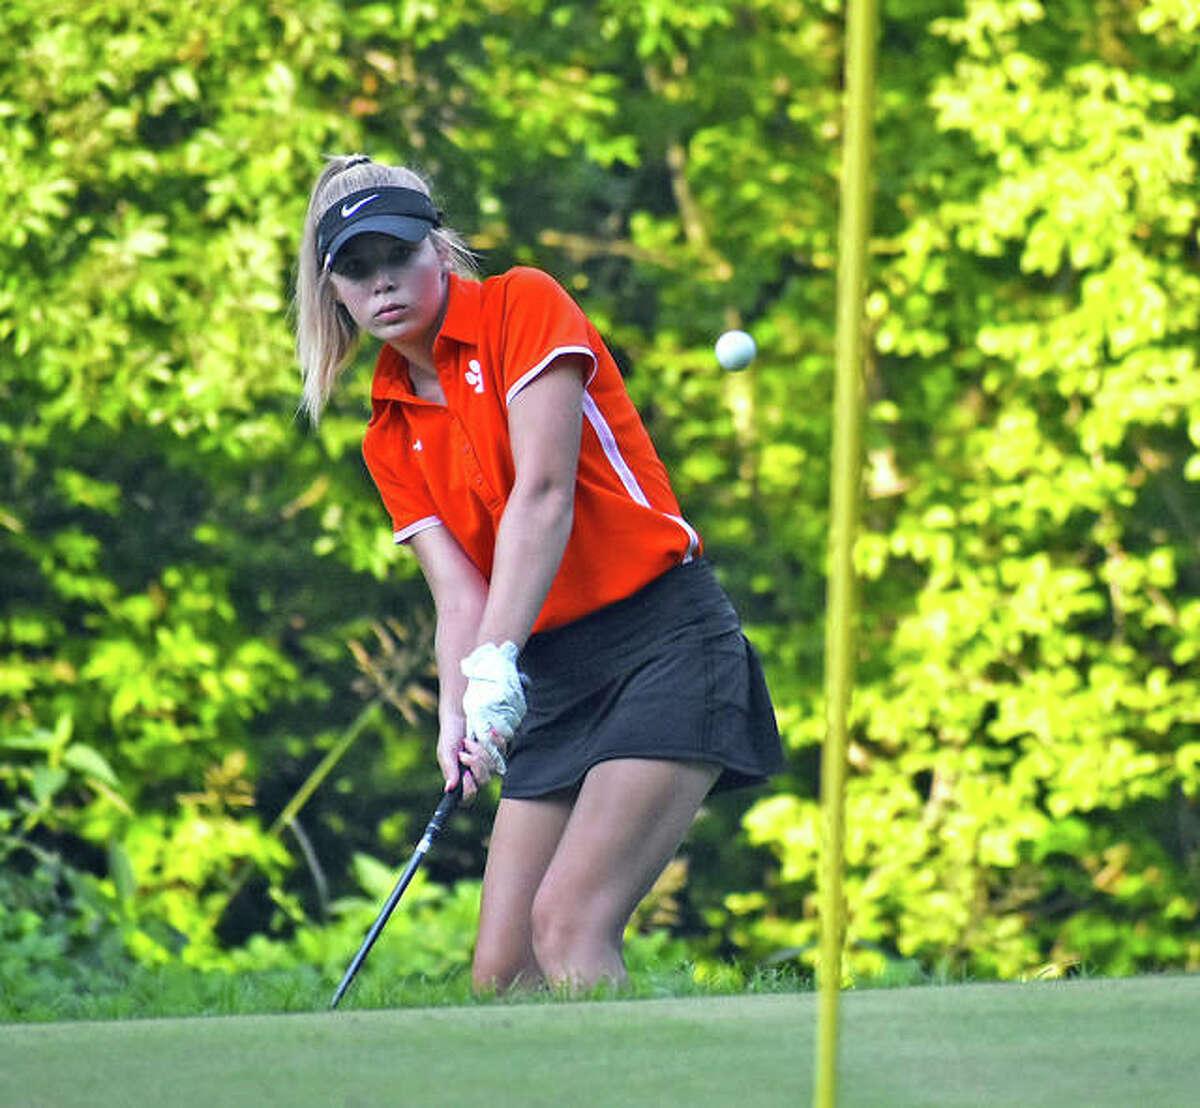 Edwardsville's Sophia Rankin hits a chip shot onto the green on Hole No. 5 at Woodlands Golf Club on Saturday during the Alton Kick-Off Scramble/Shamble.